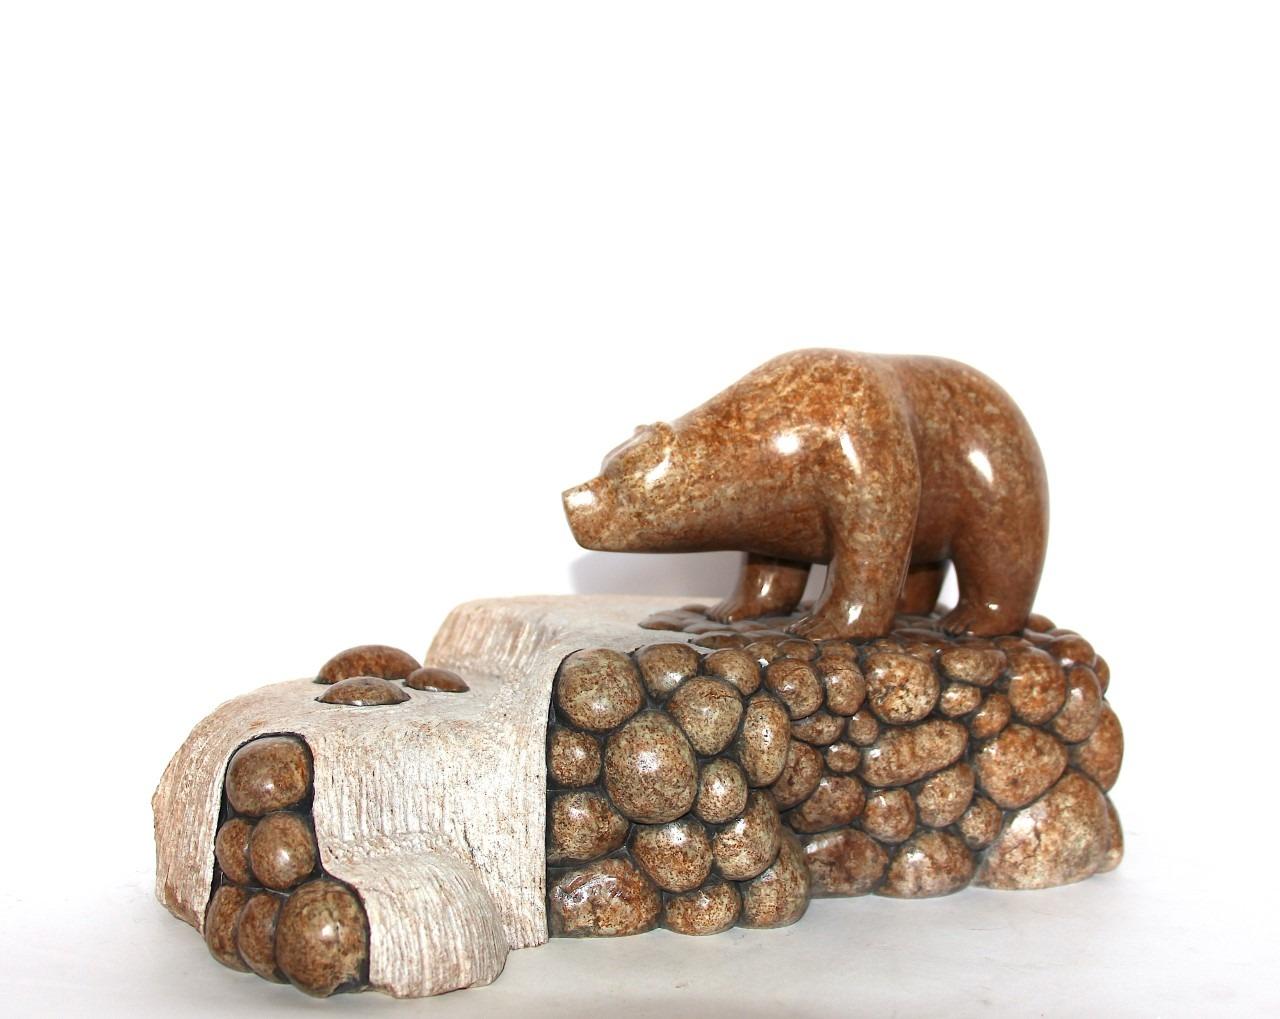 bear fishing in stream Iroquois Art Sculpture in soapstone